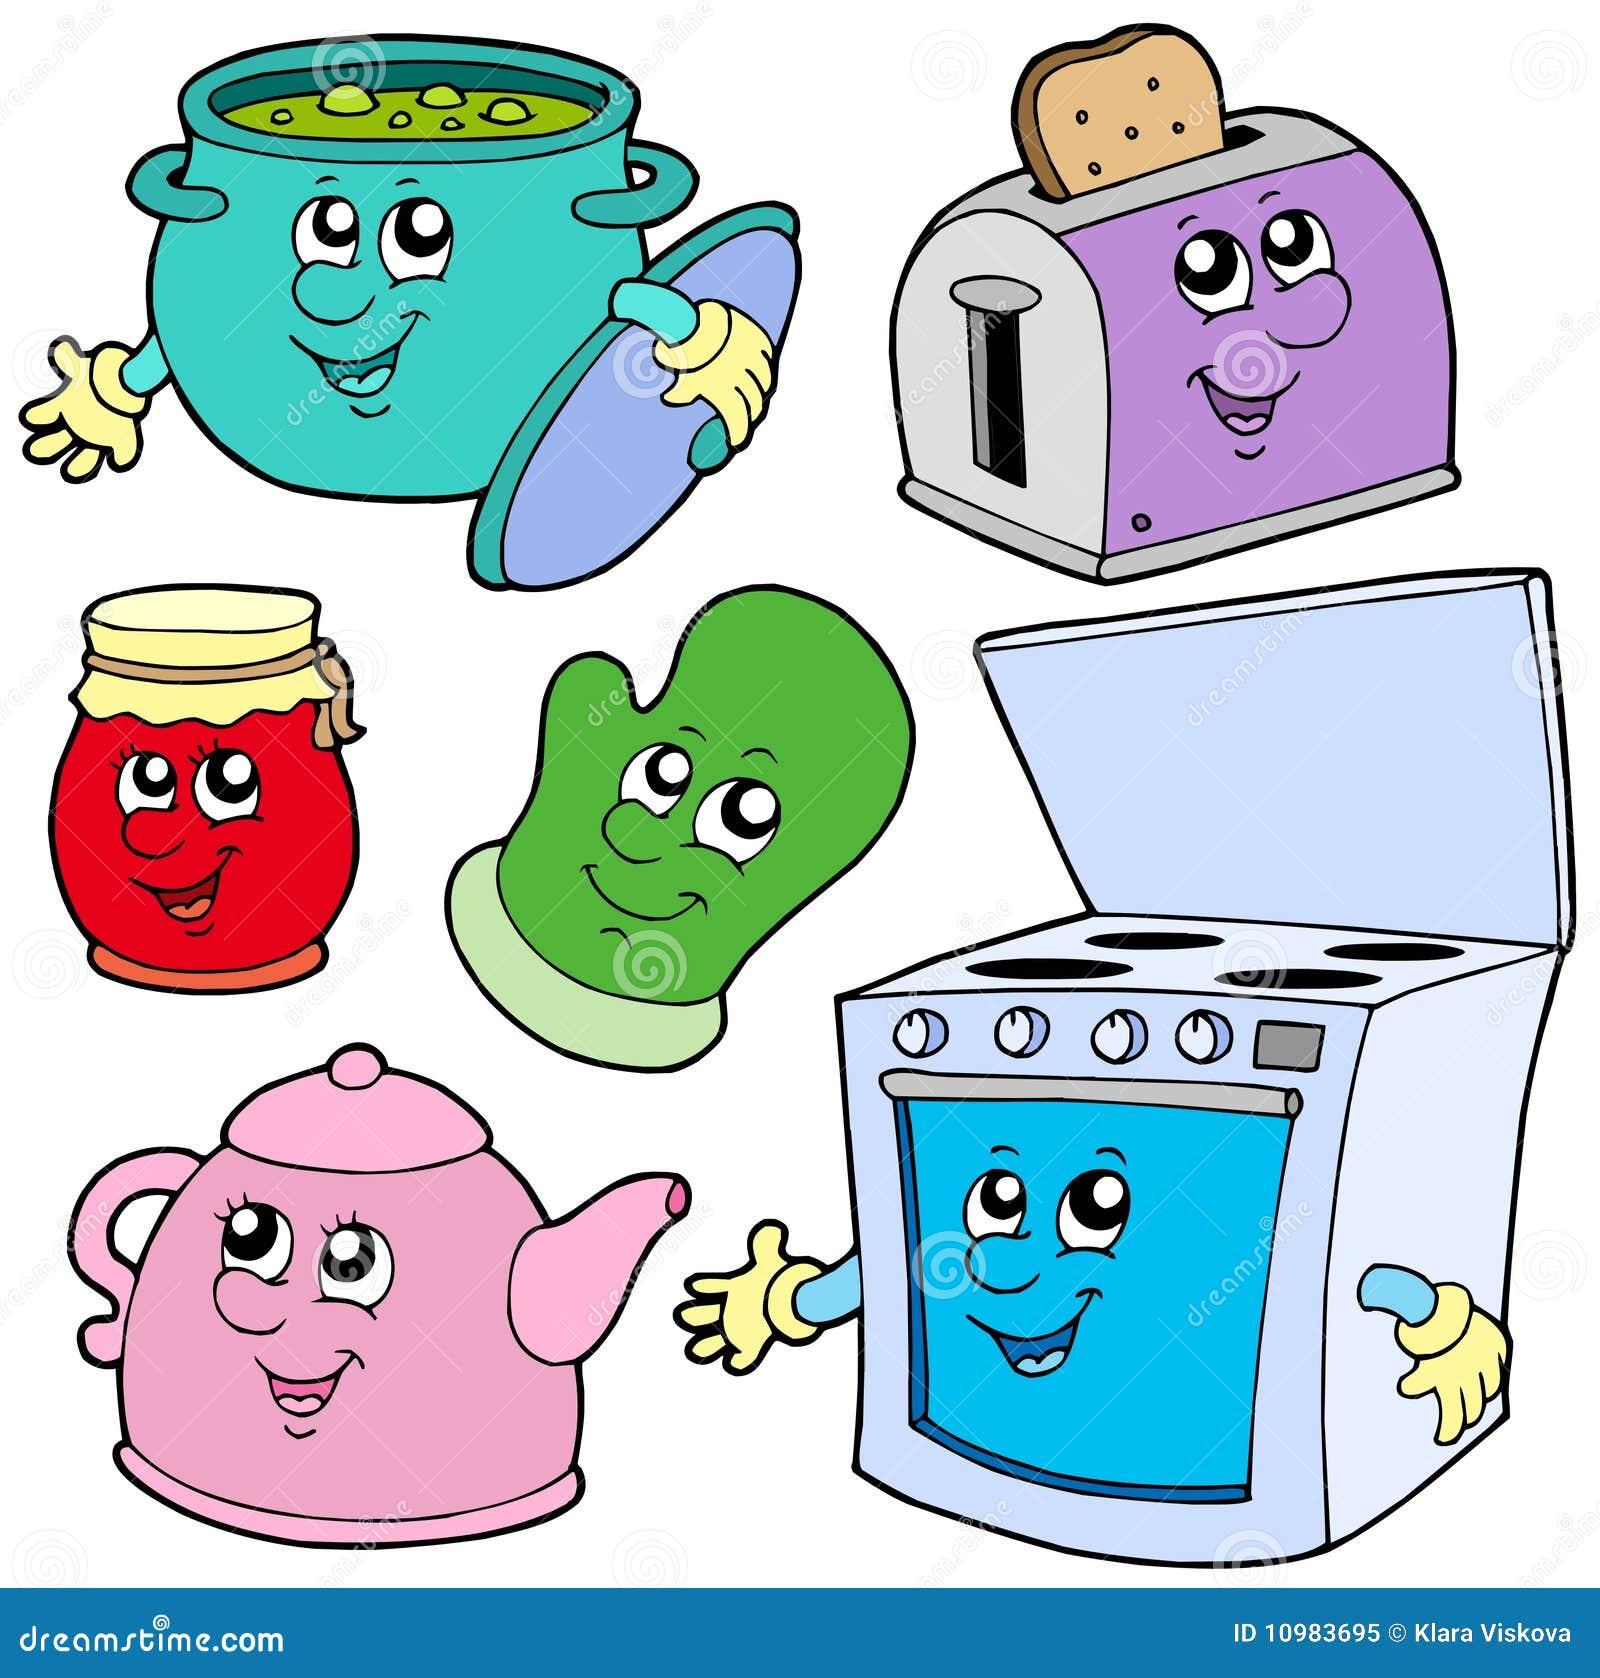 Kitchen Cartoons Royalty Free Stock Photo Image: 10983695 #C90218 1300 1380